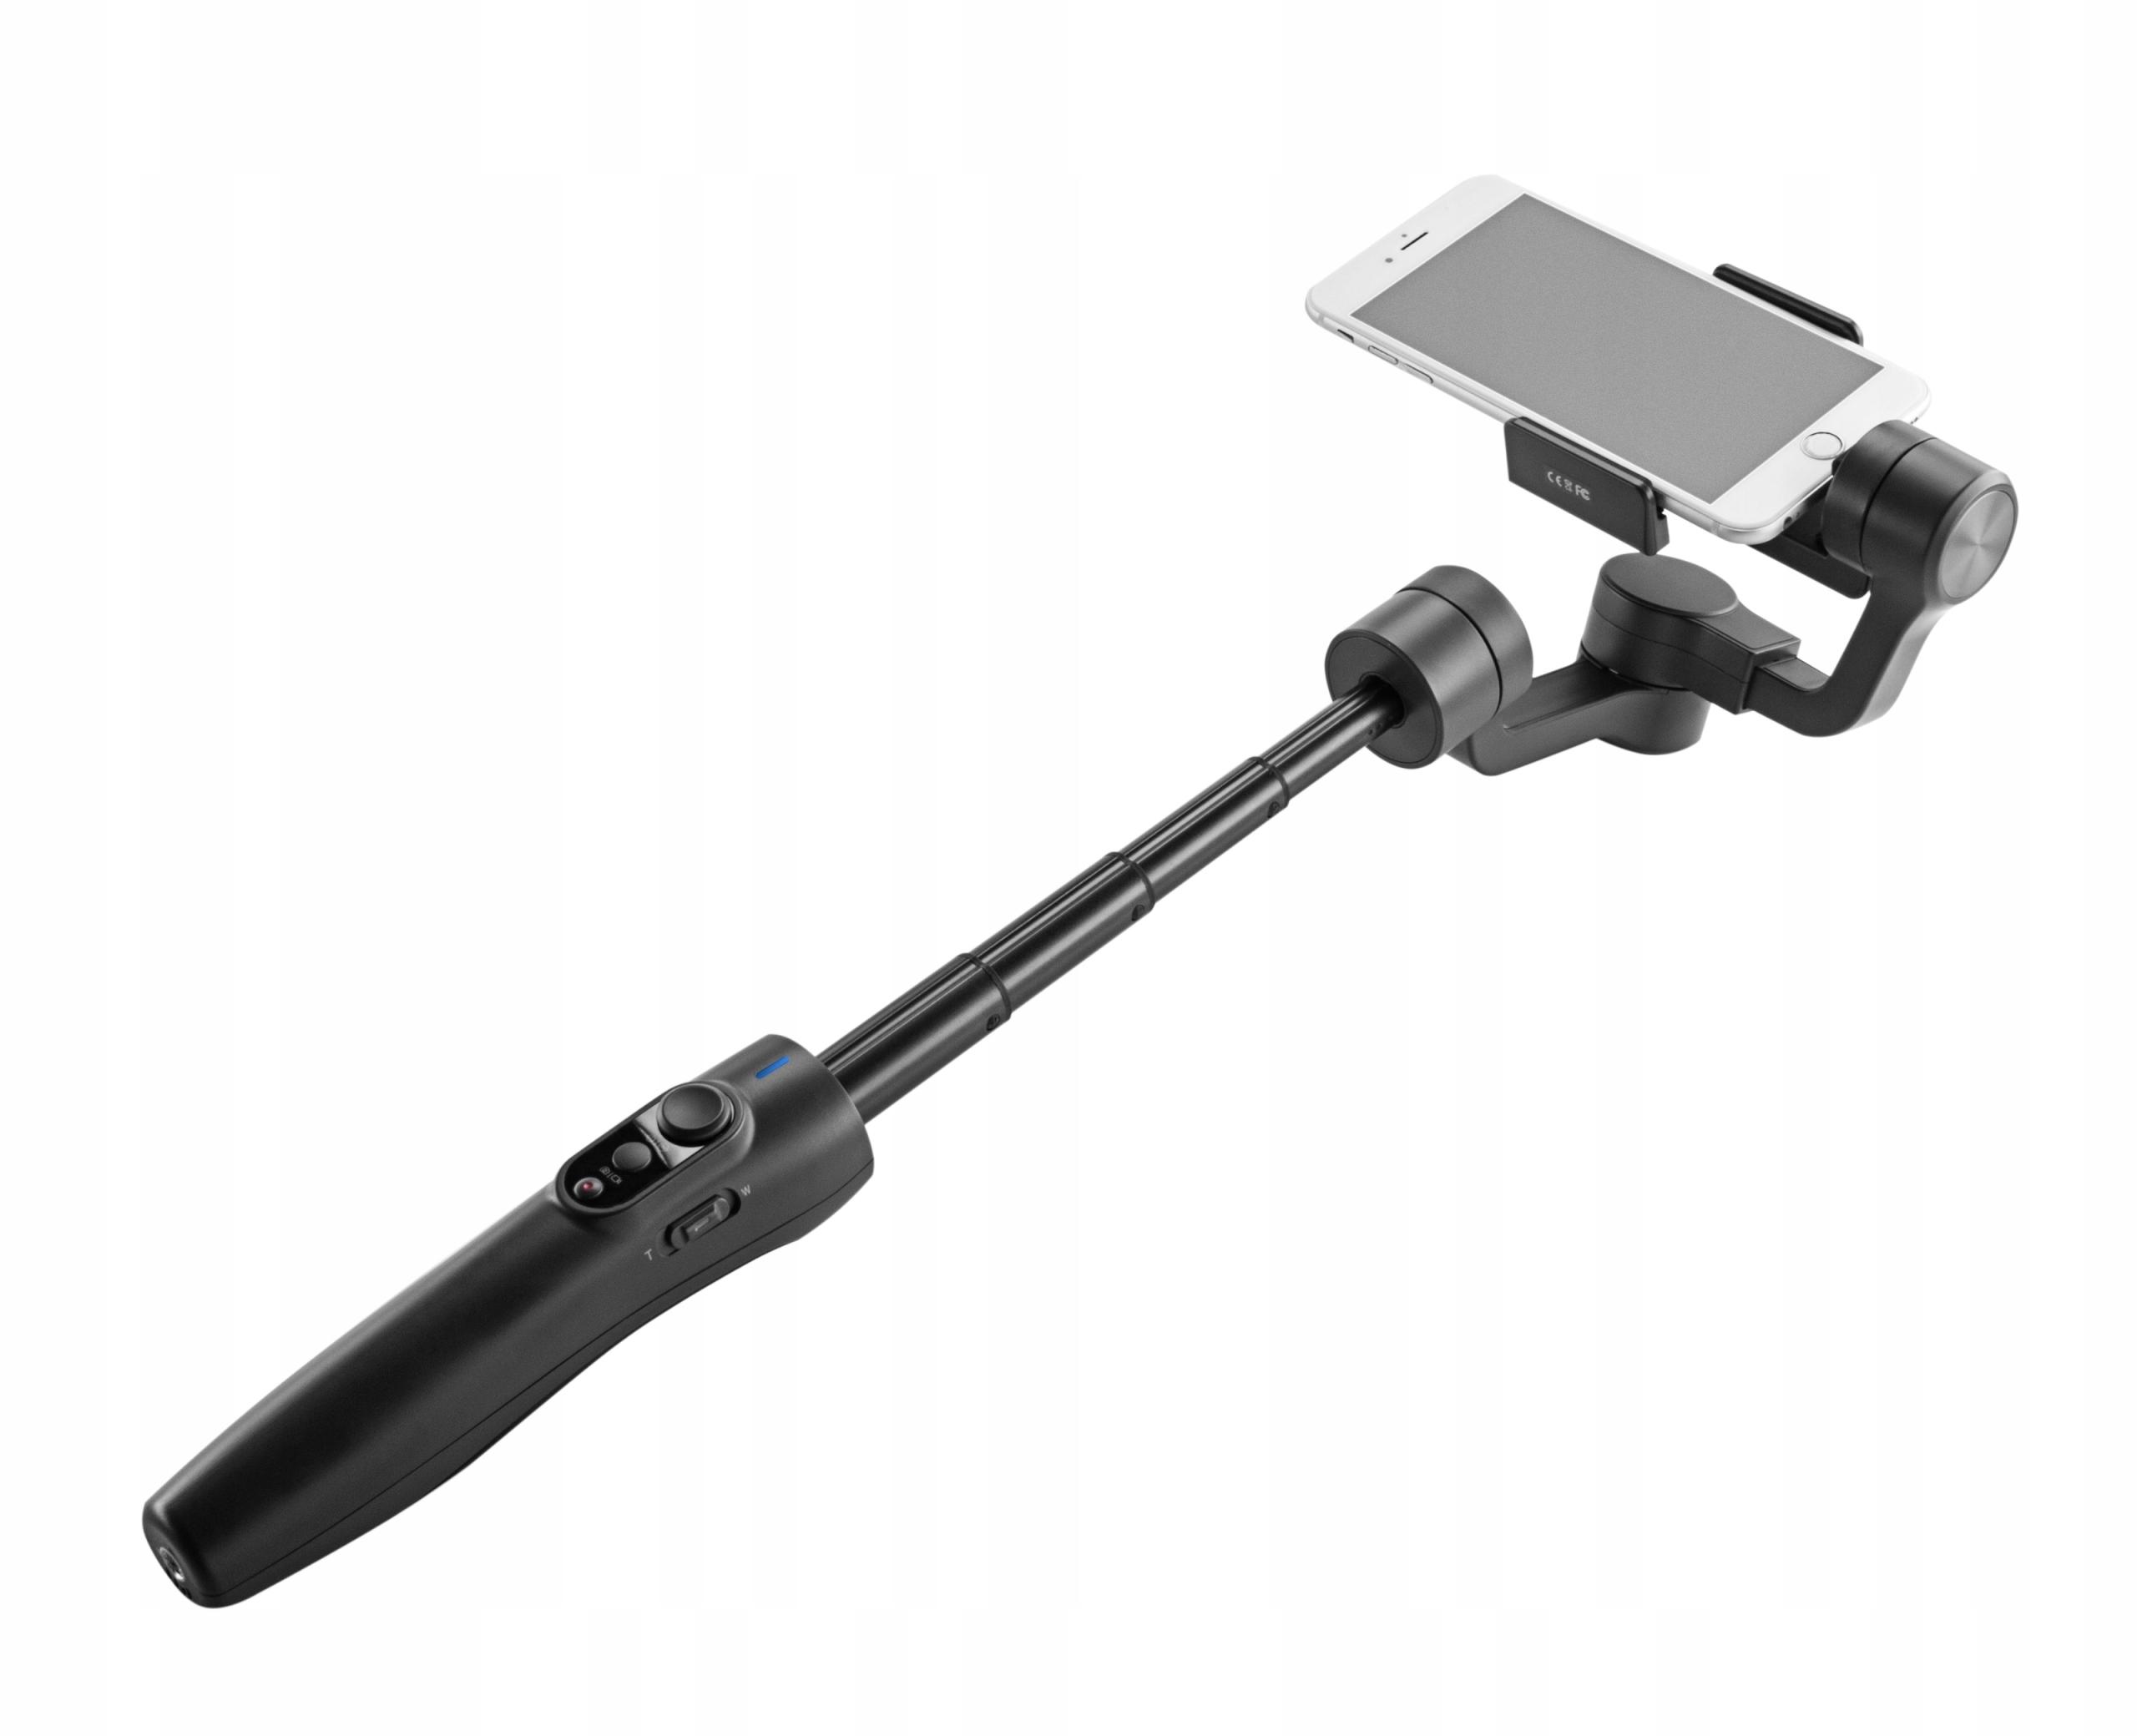 фото стабилизатора для телефона с моноподом Feiyu Tech Vimble 2S